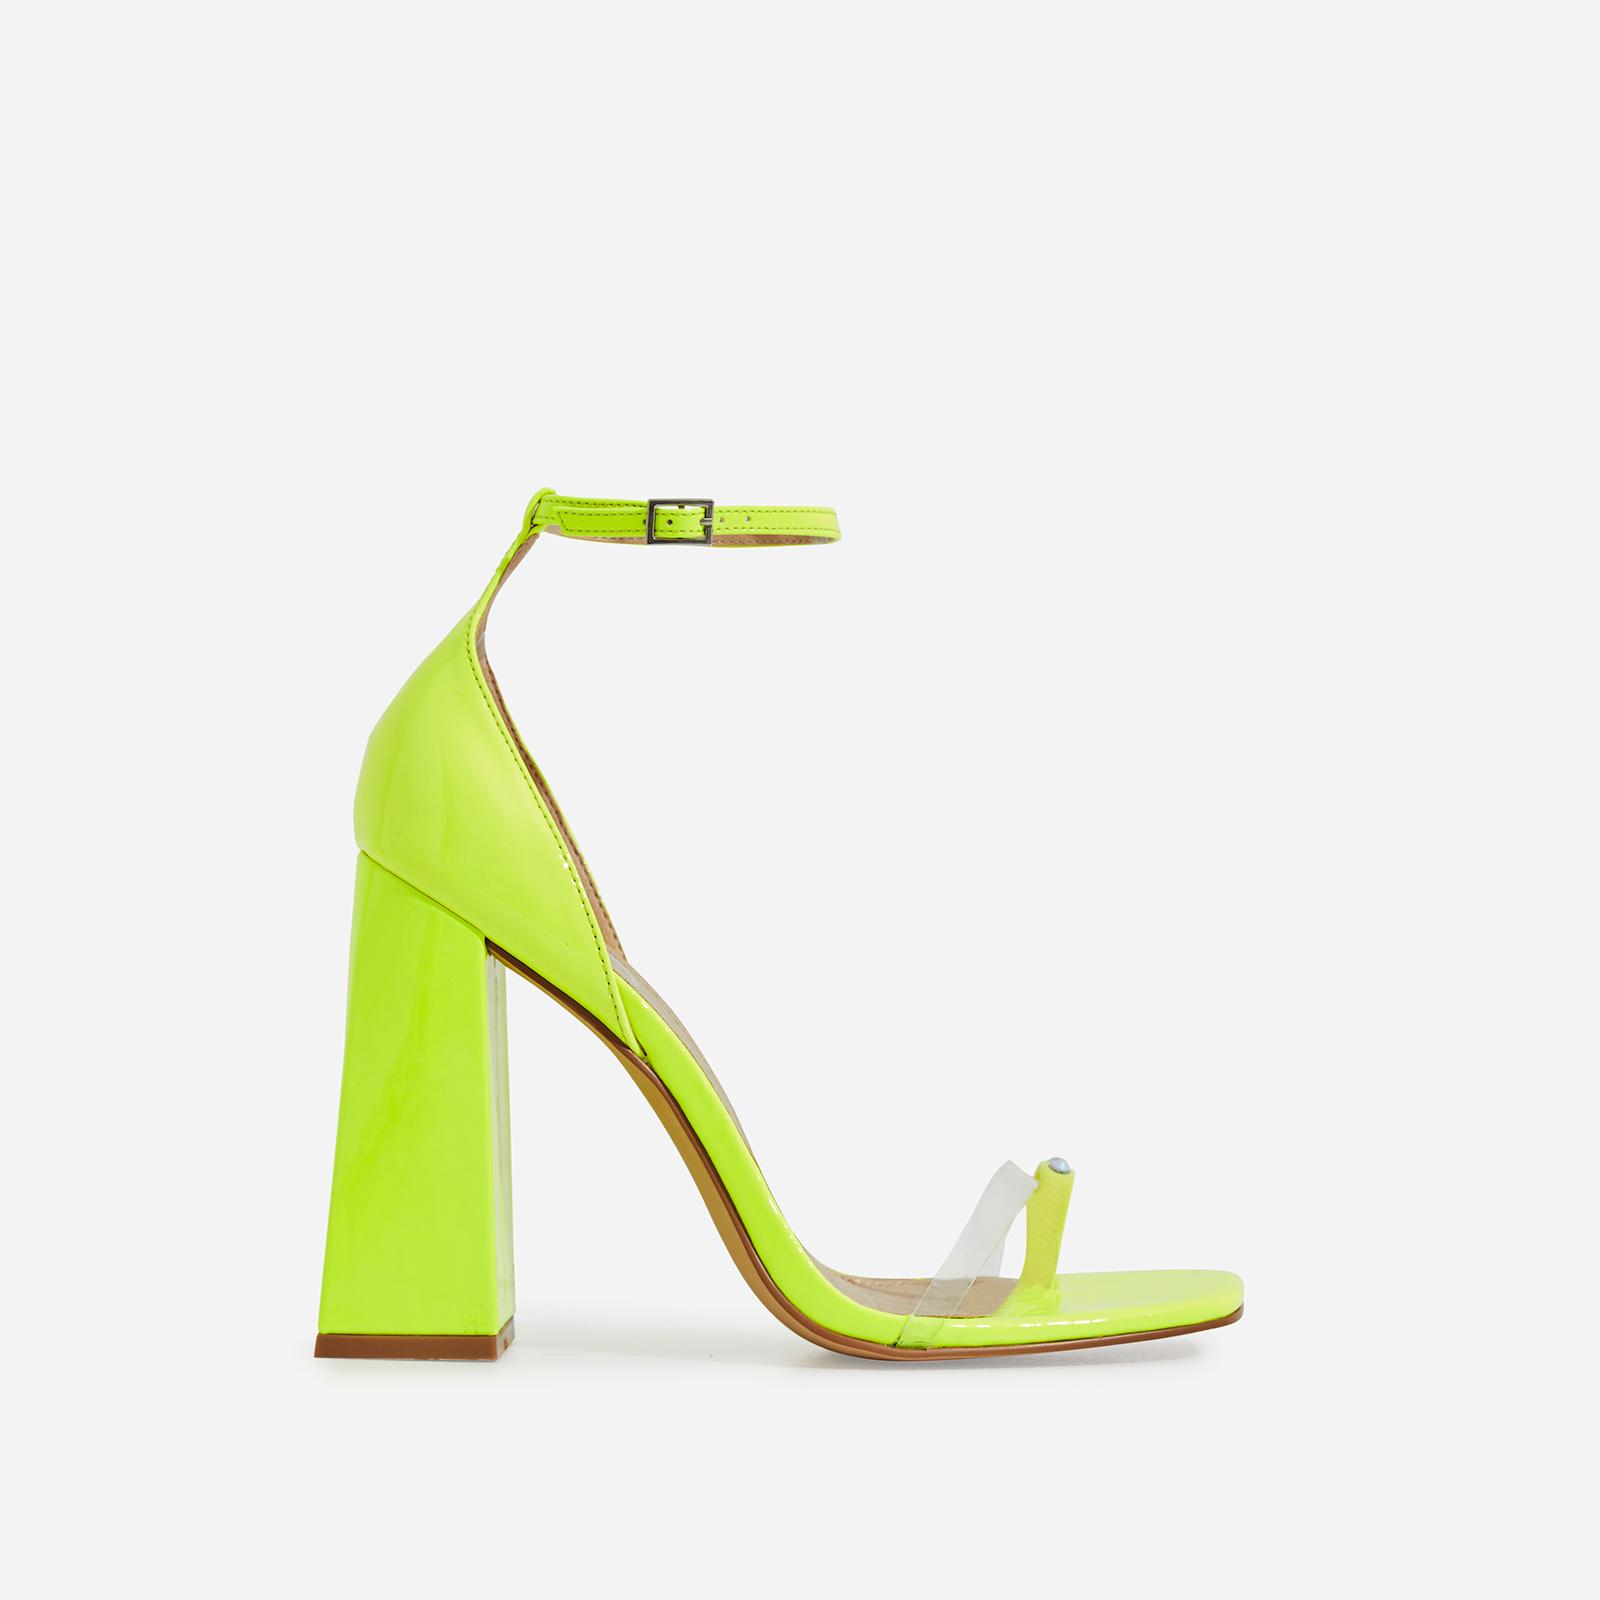 Perch Diamante Detail Strap Square Toe Perspex Flared Block Heel In Neon Yellow Patent